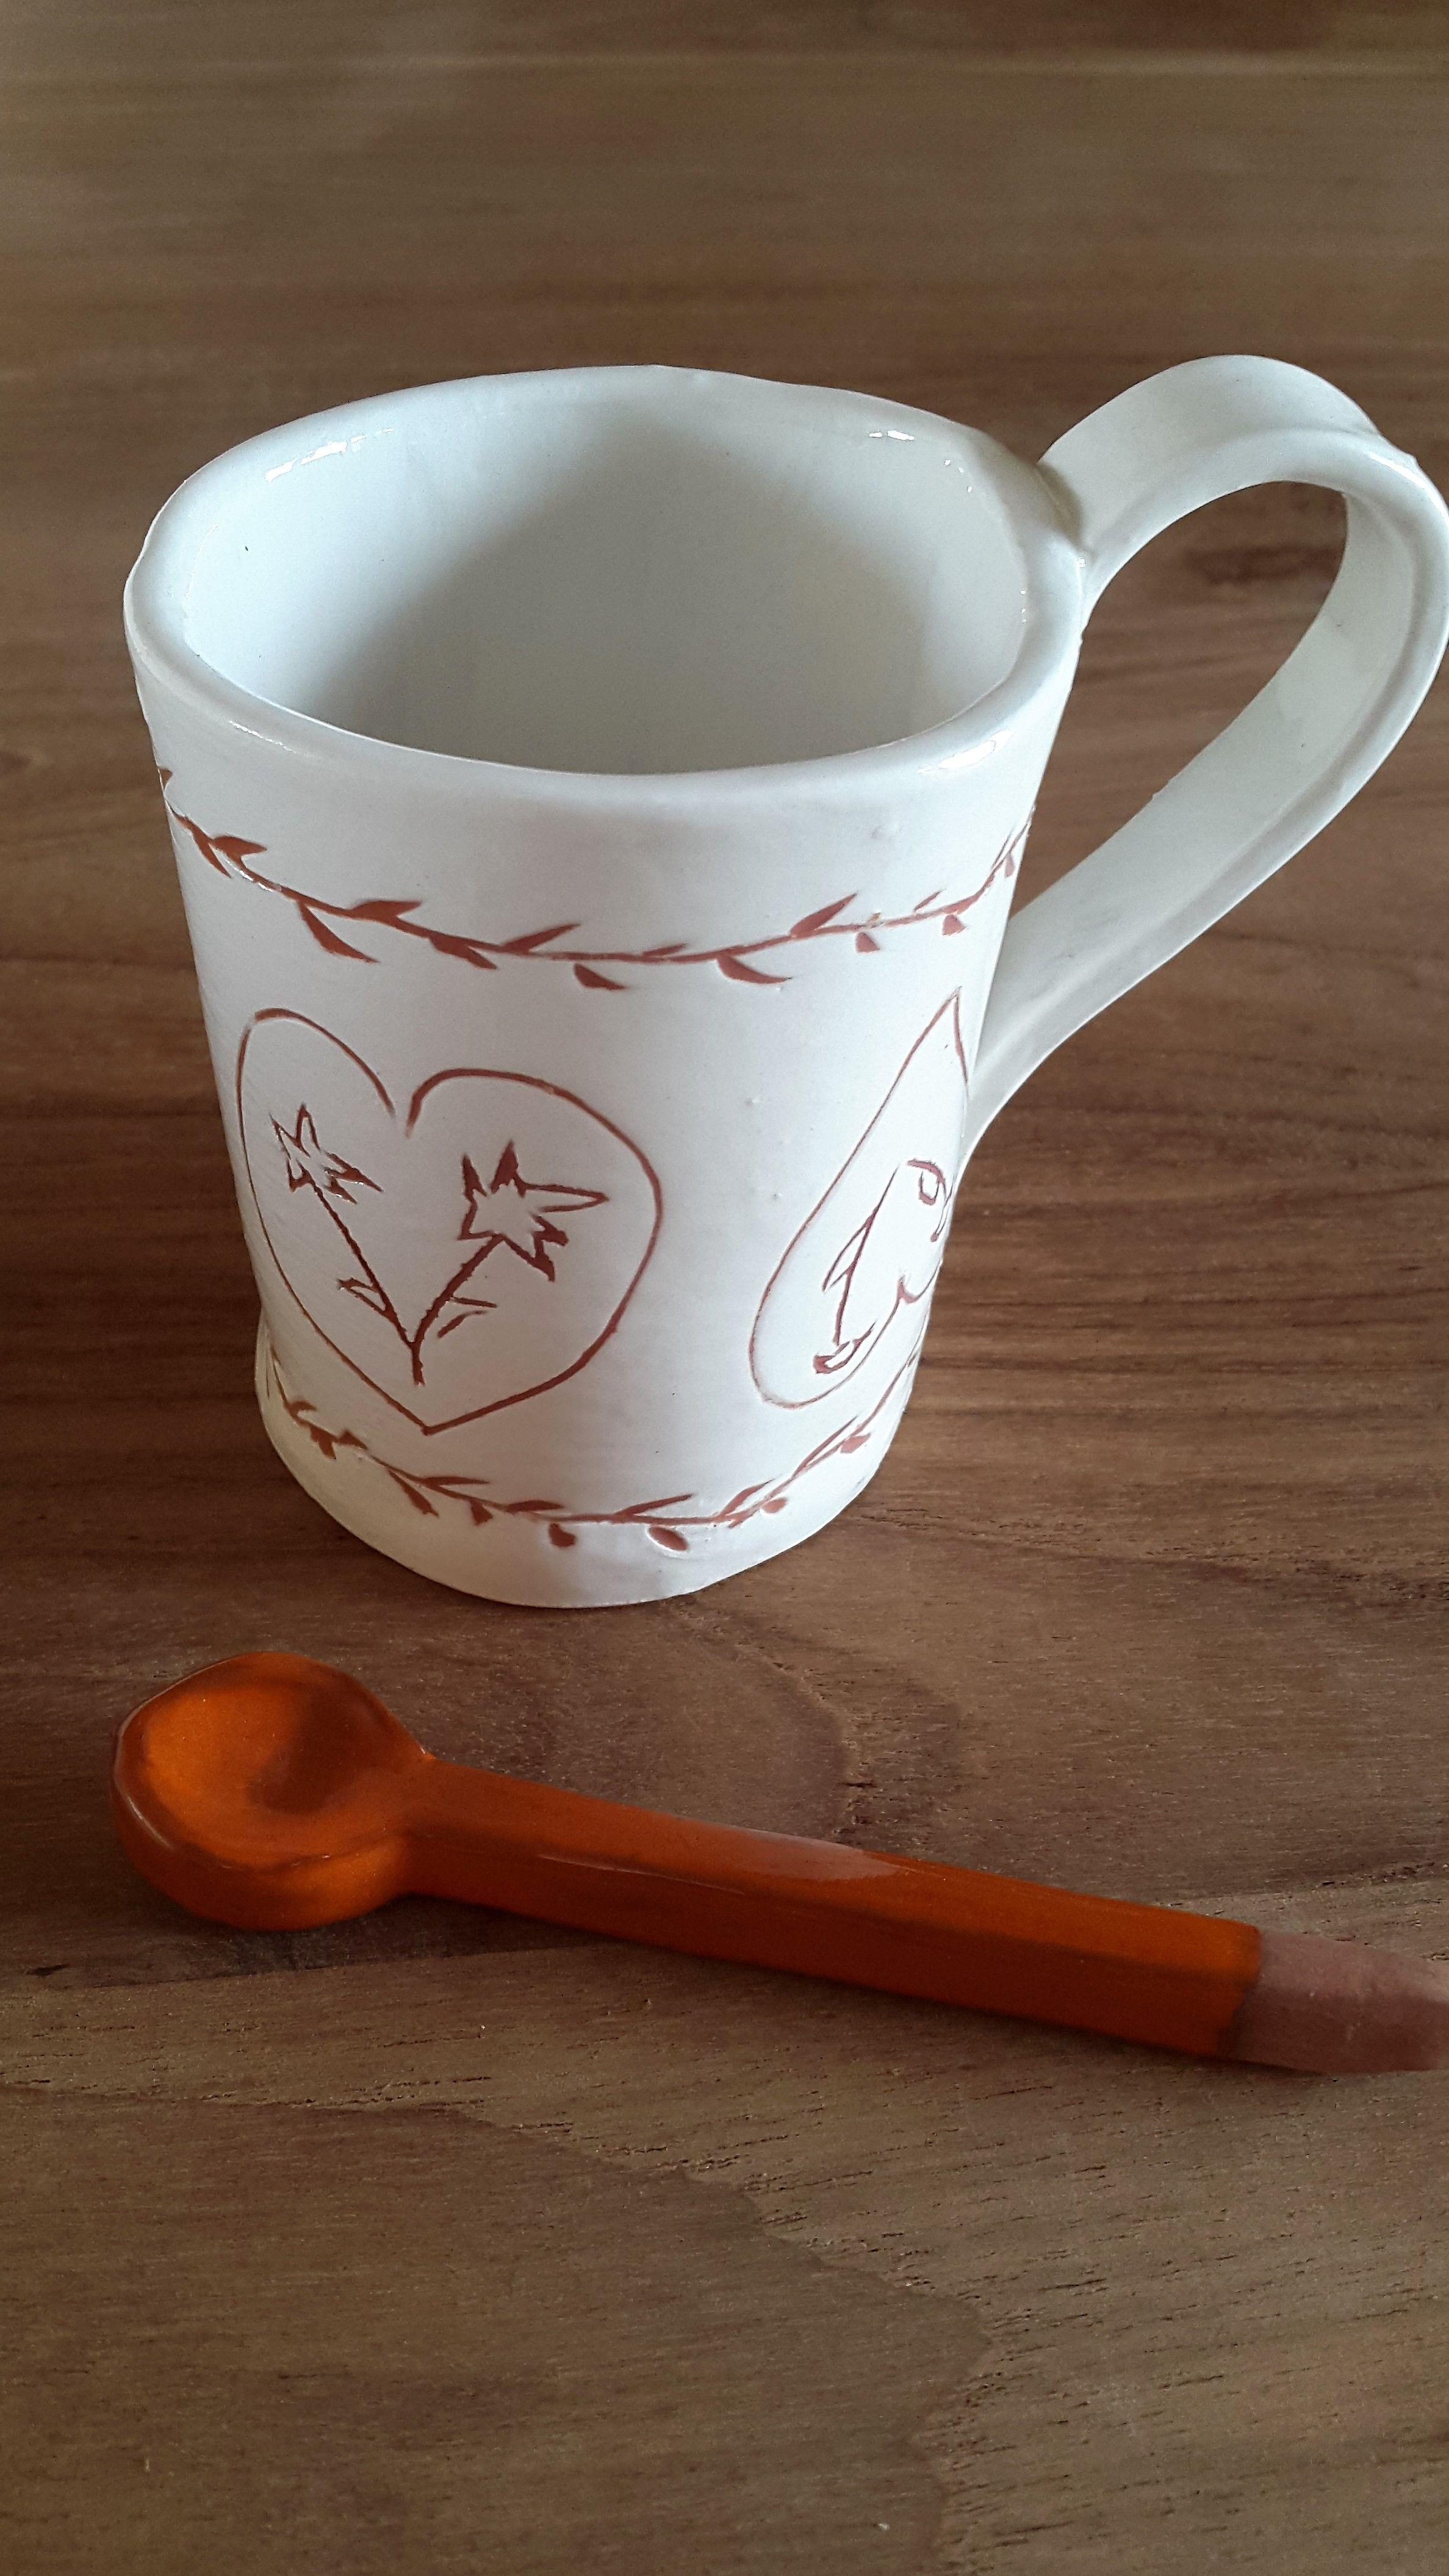 Main ProvenceFaite Mug Potterybycolette Céramique By 3jL54AR